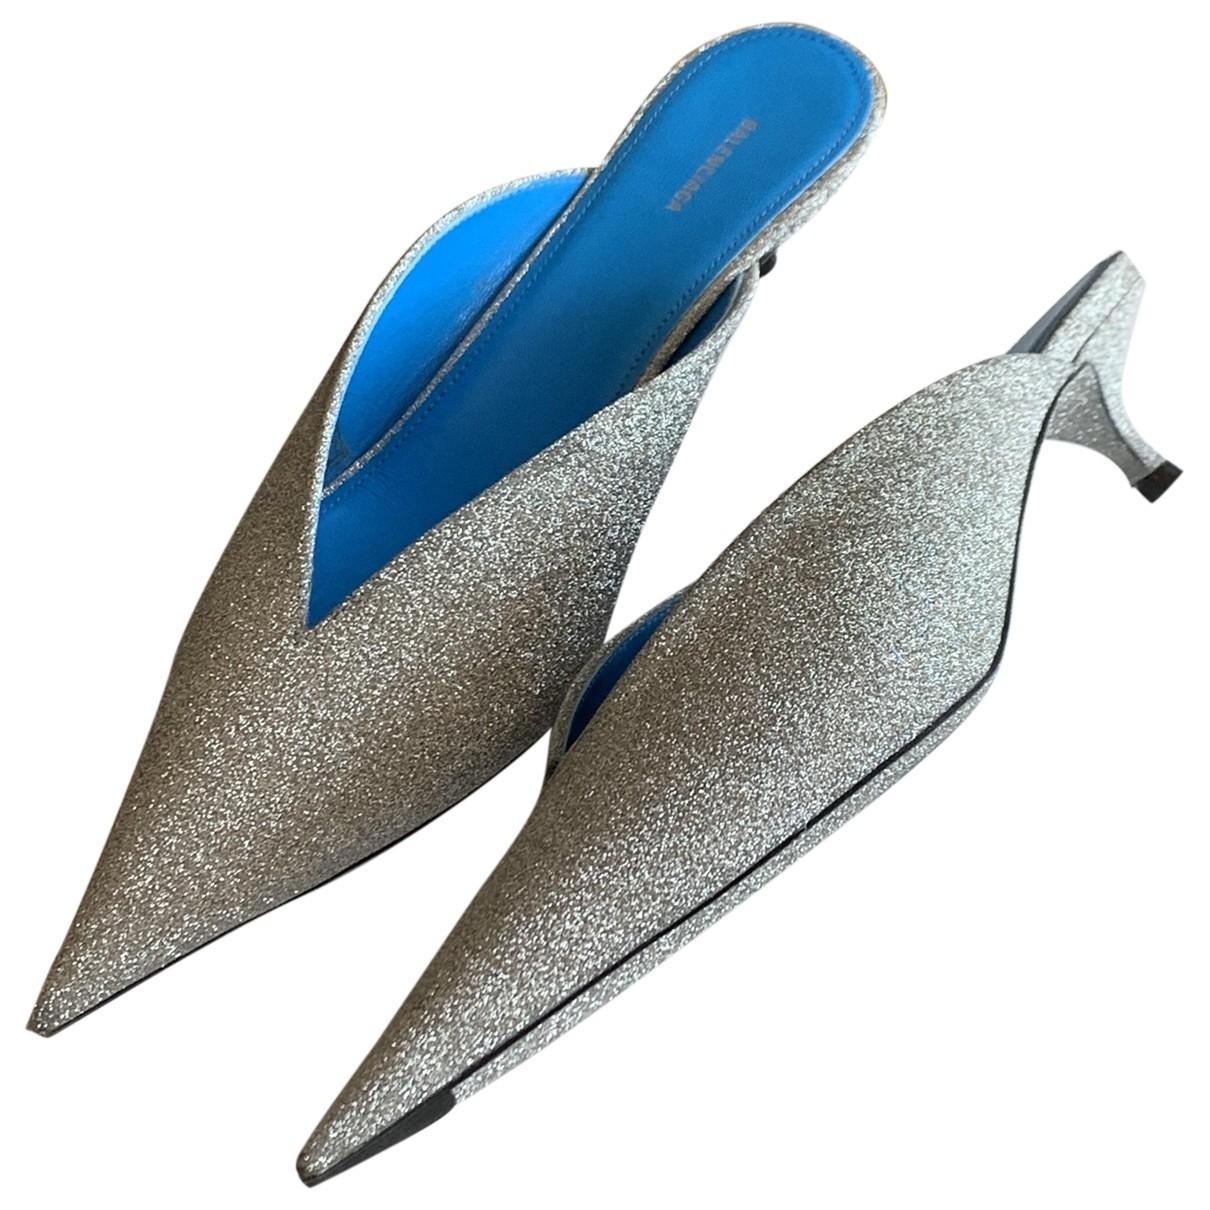 Balenciaga Knife Sandalen in  Silber Mit Pailletten